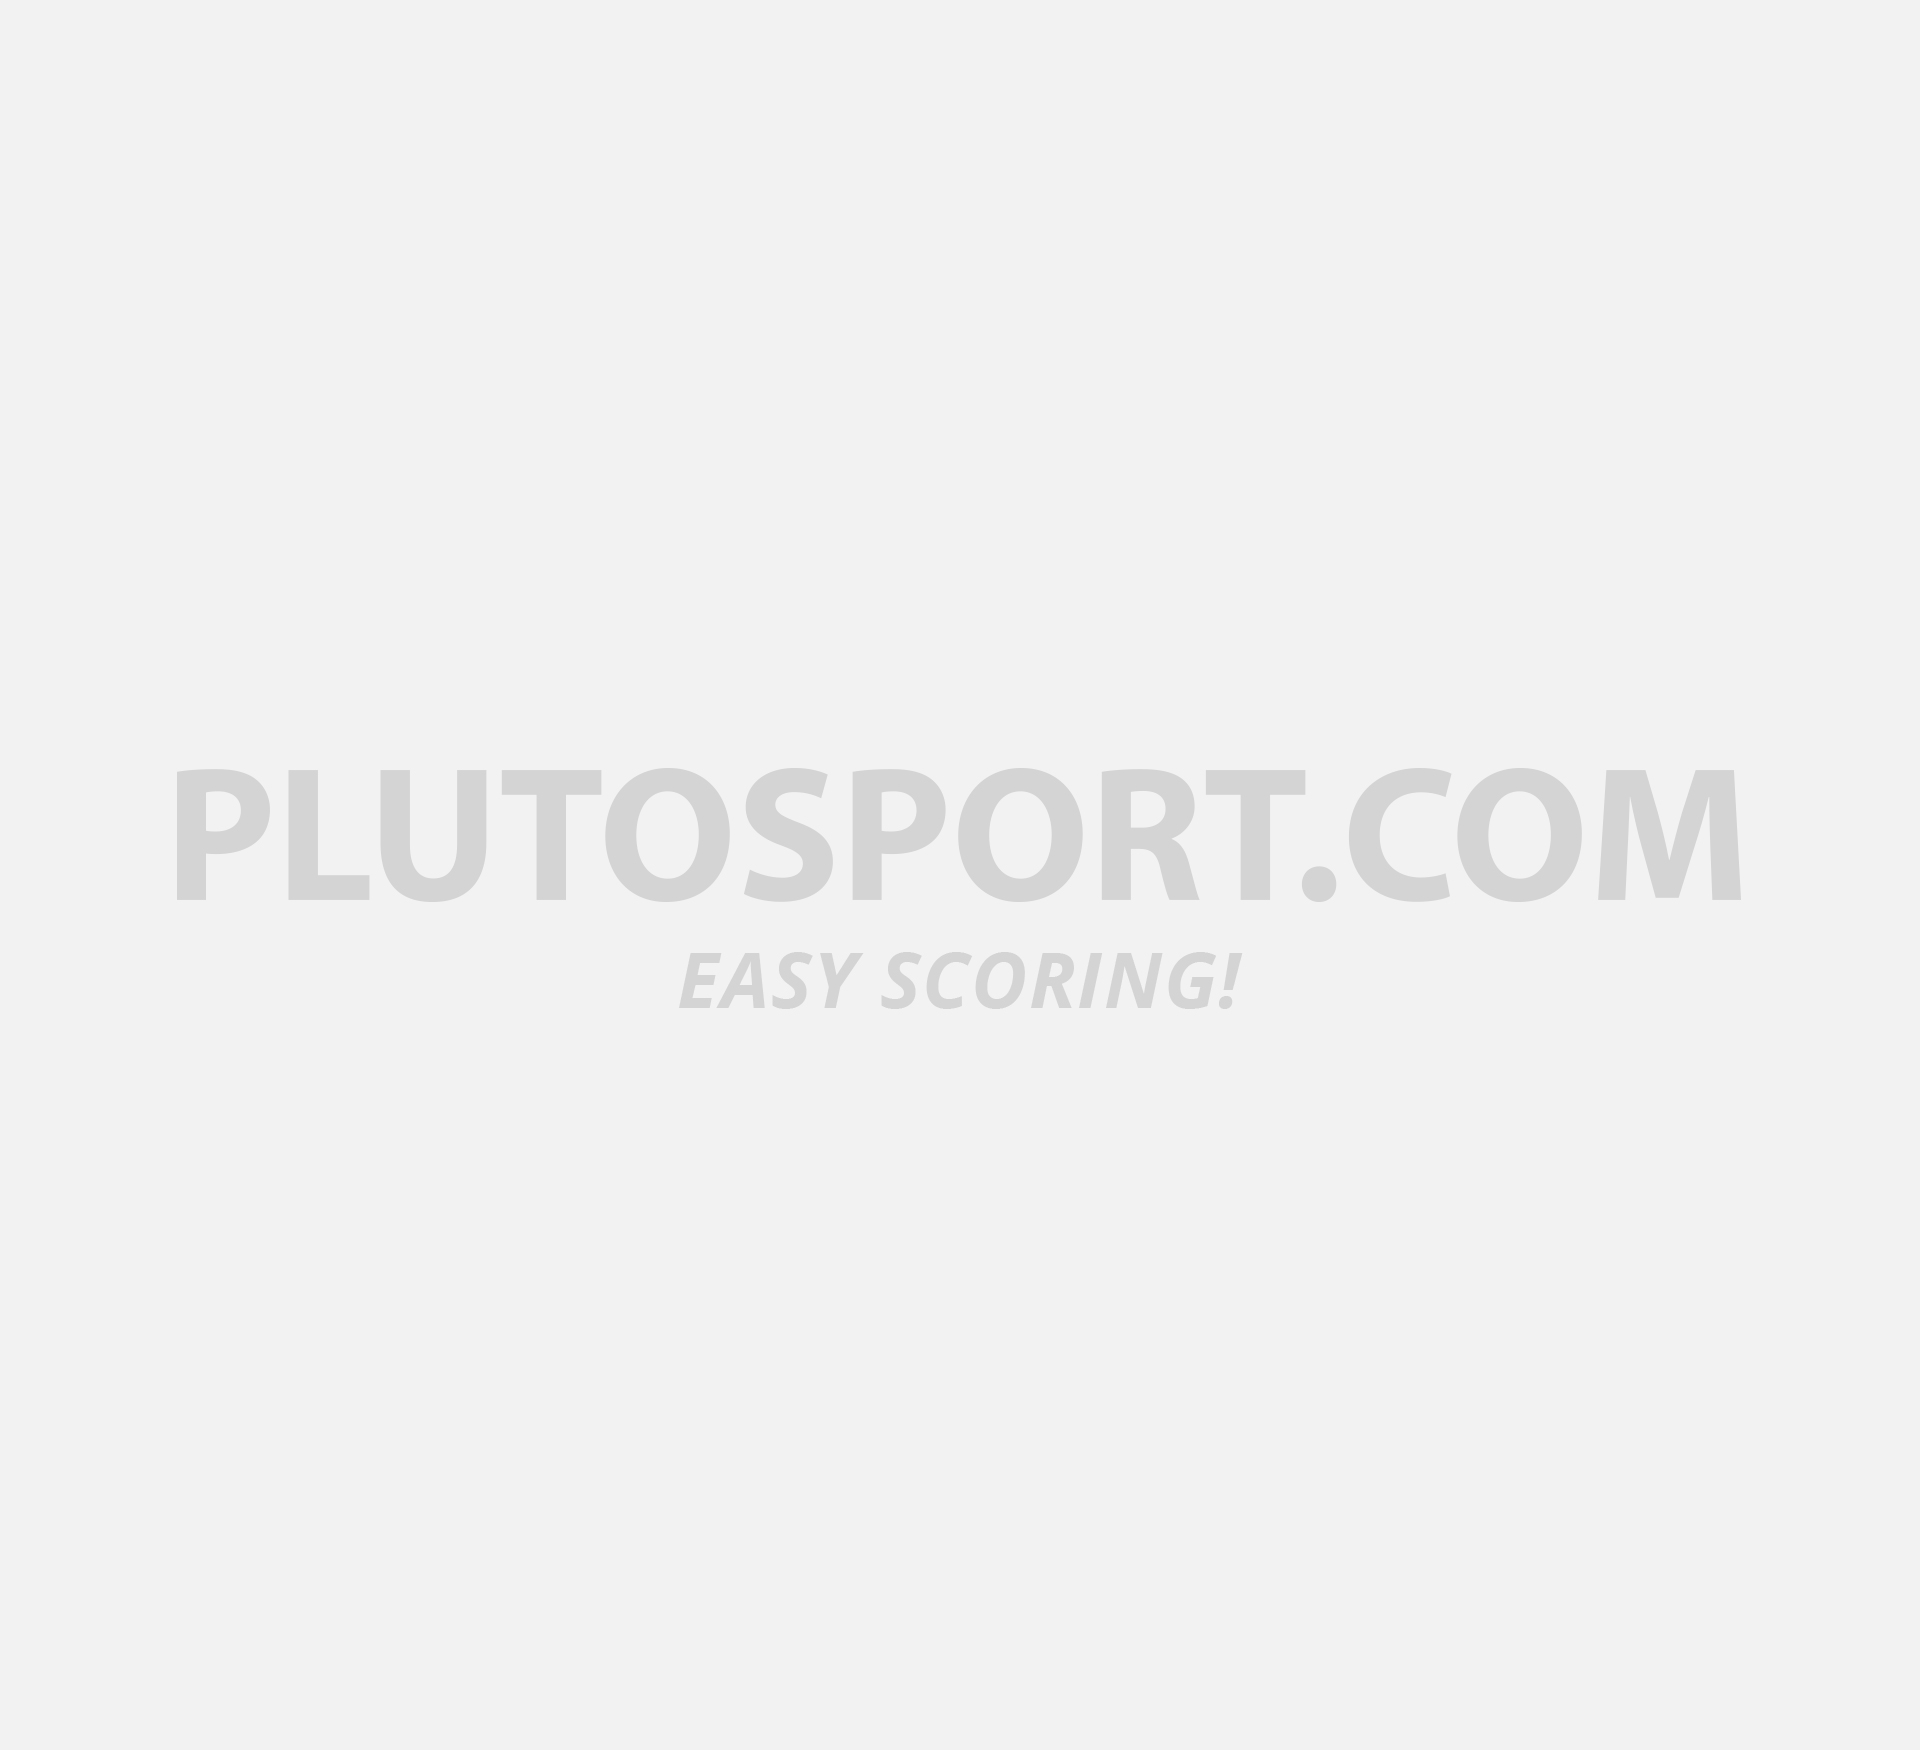 Adidas Tiro 17 PES Jacket - Track Jackets - Clothing - Football - Sports | Plutosport